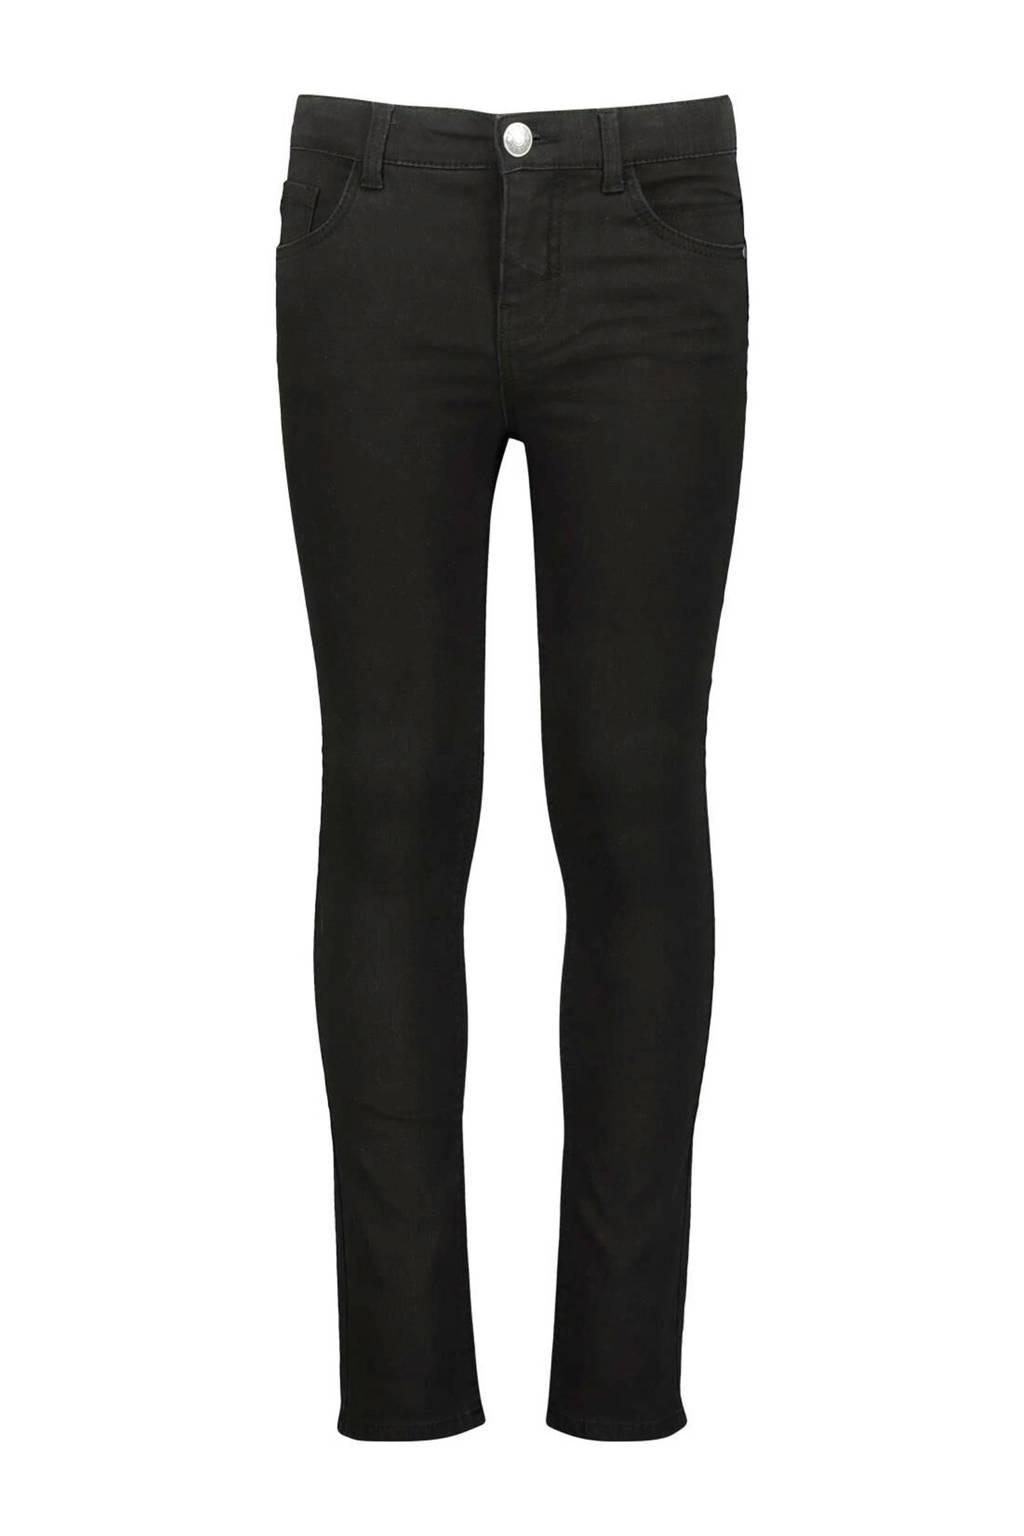 HEMA skinny jeans Pim zwart, Zwart